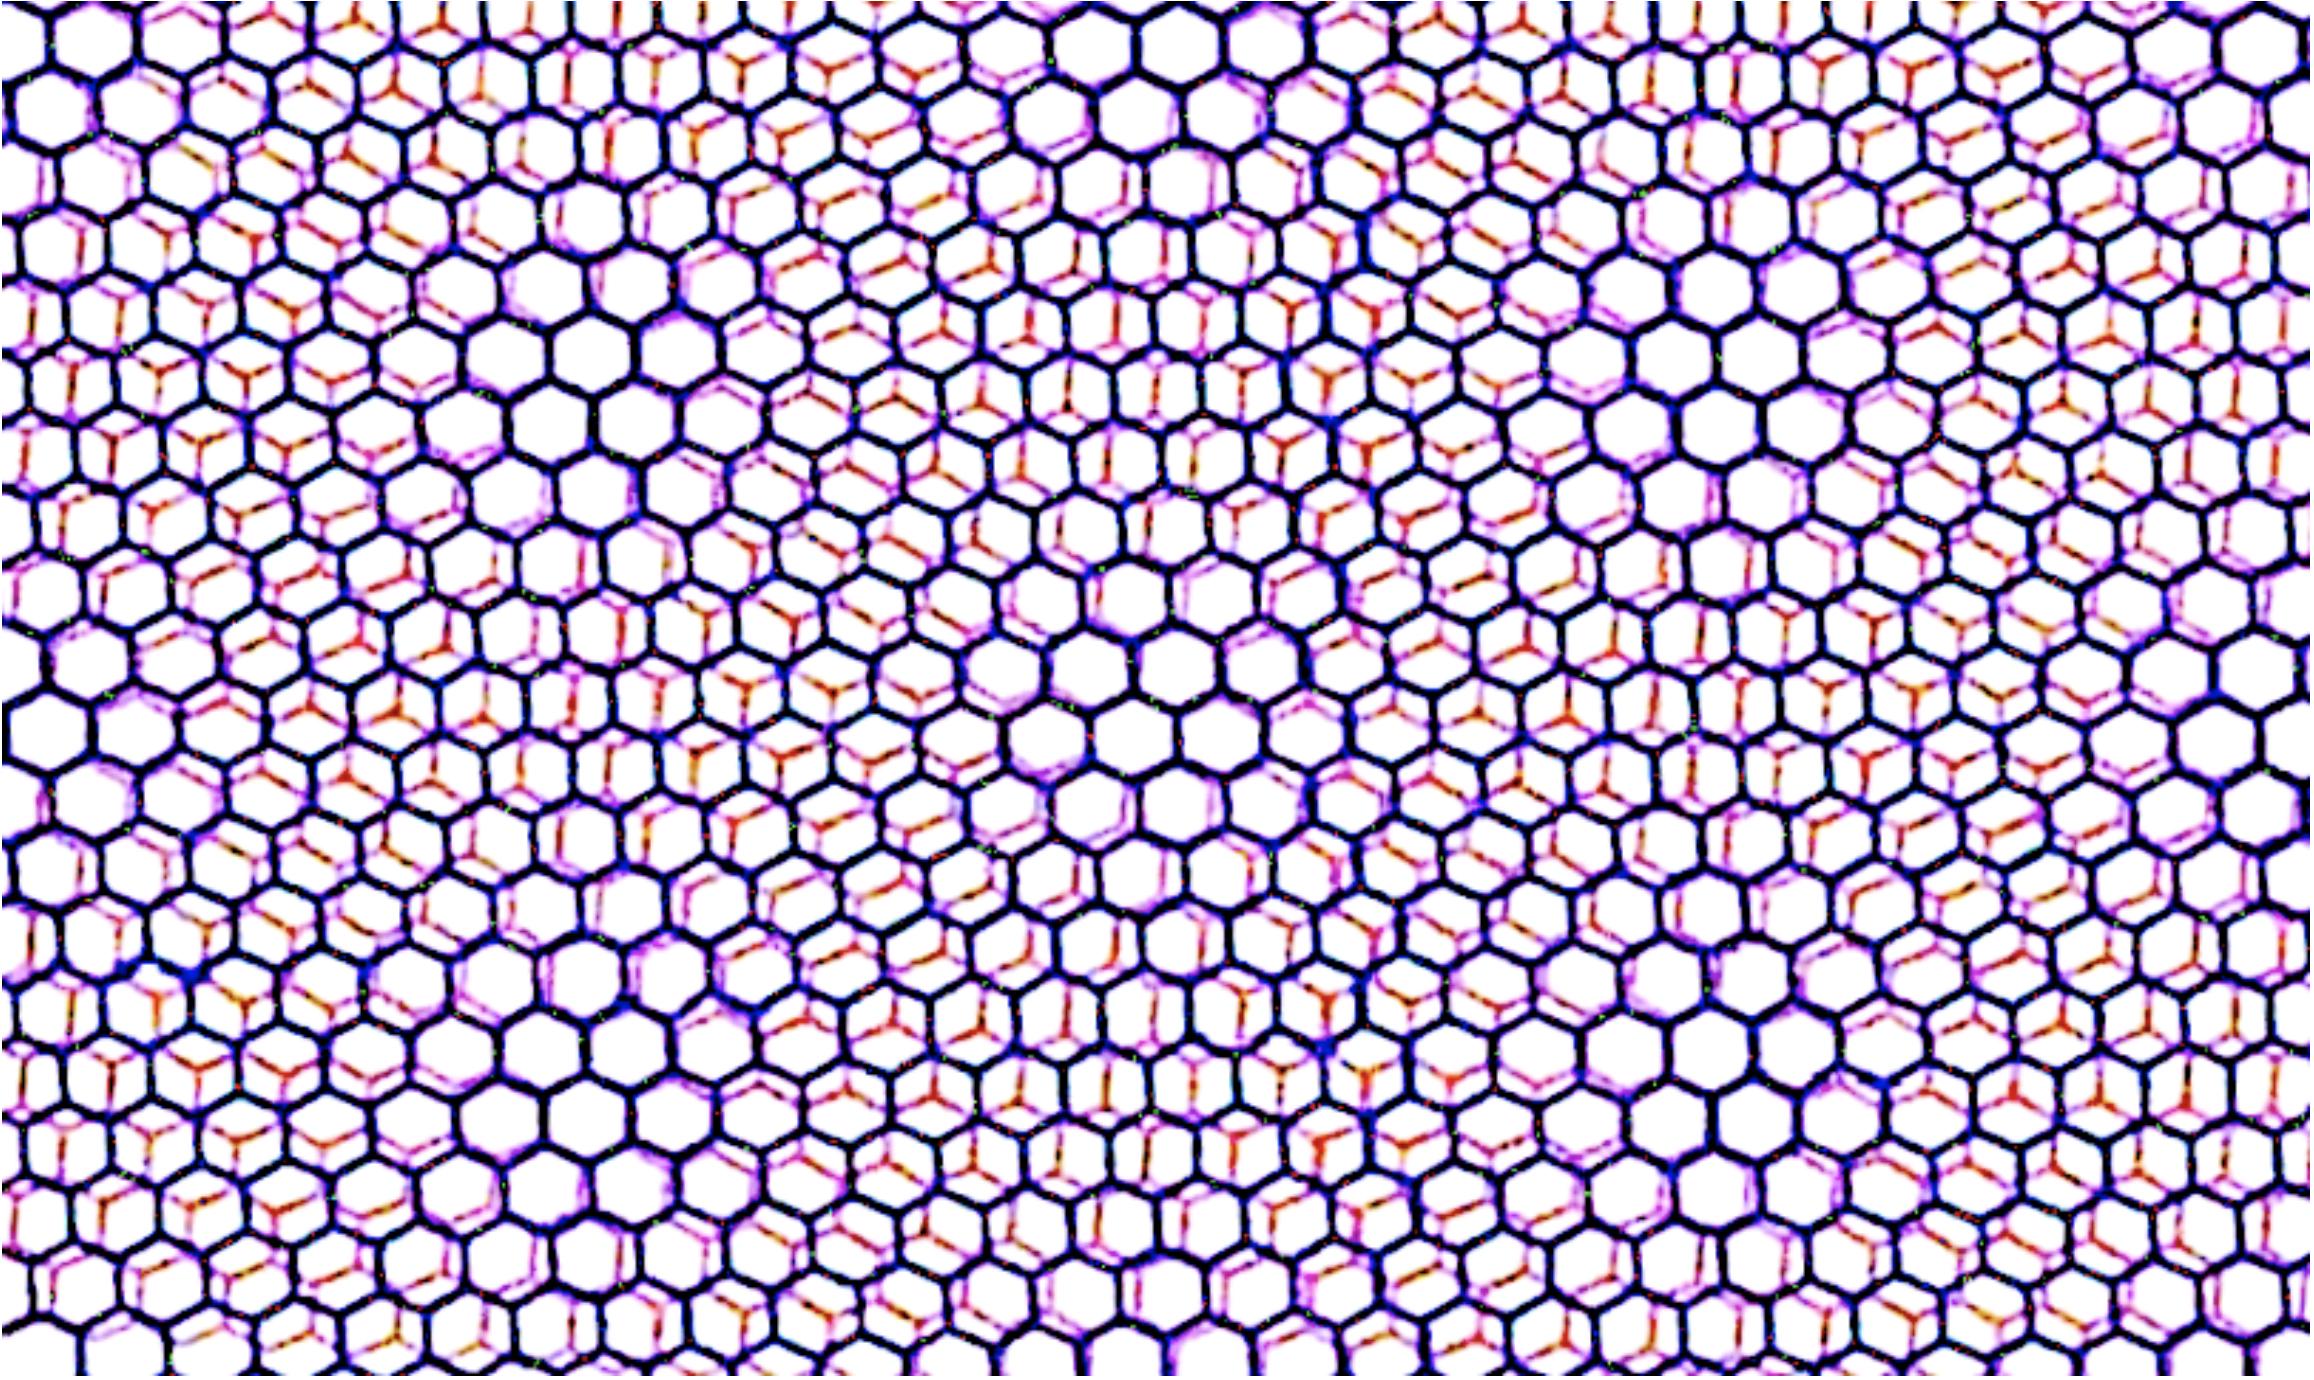 Magic angle graphene